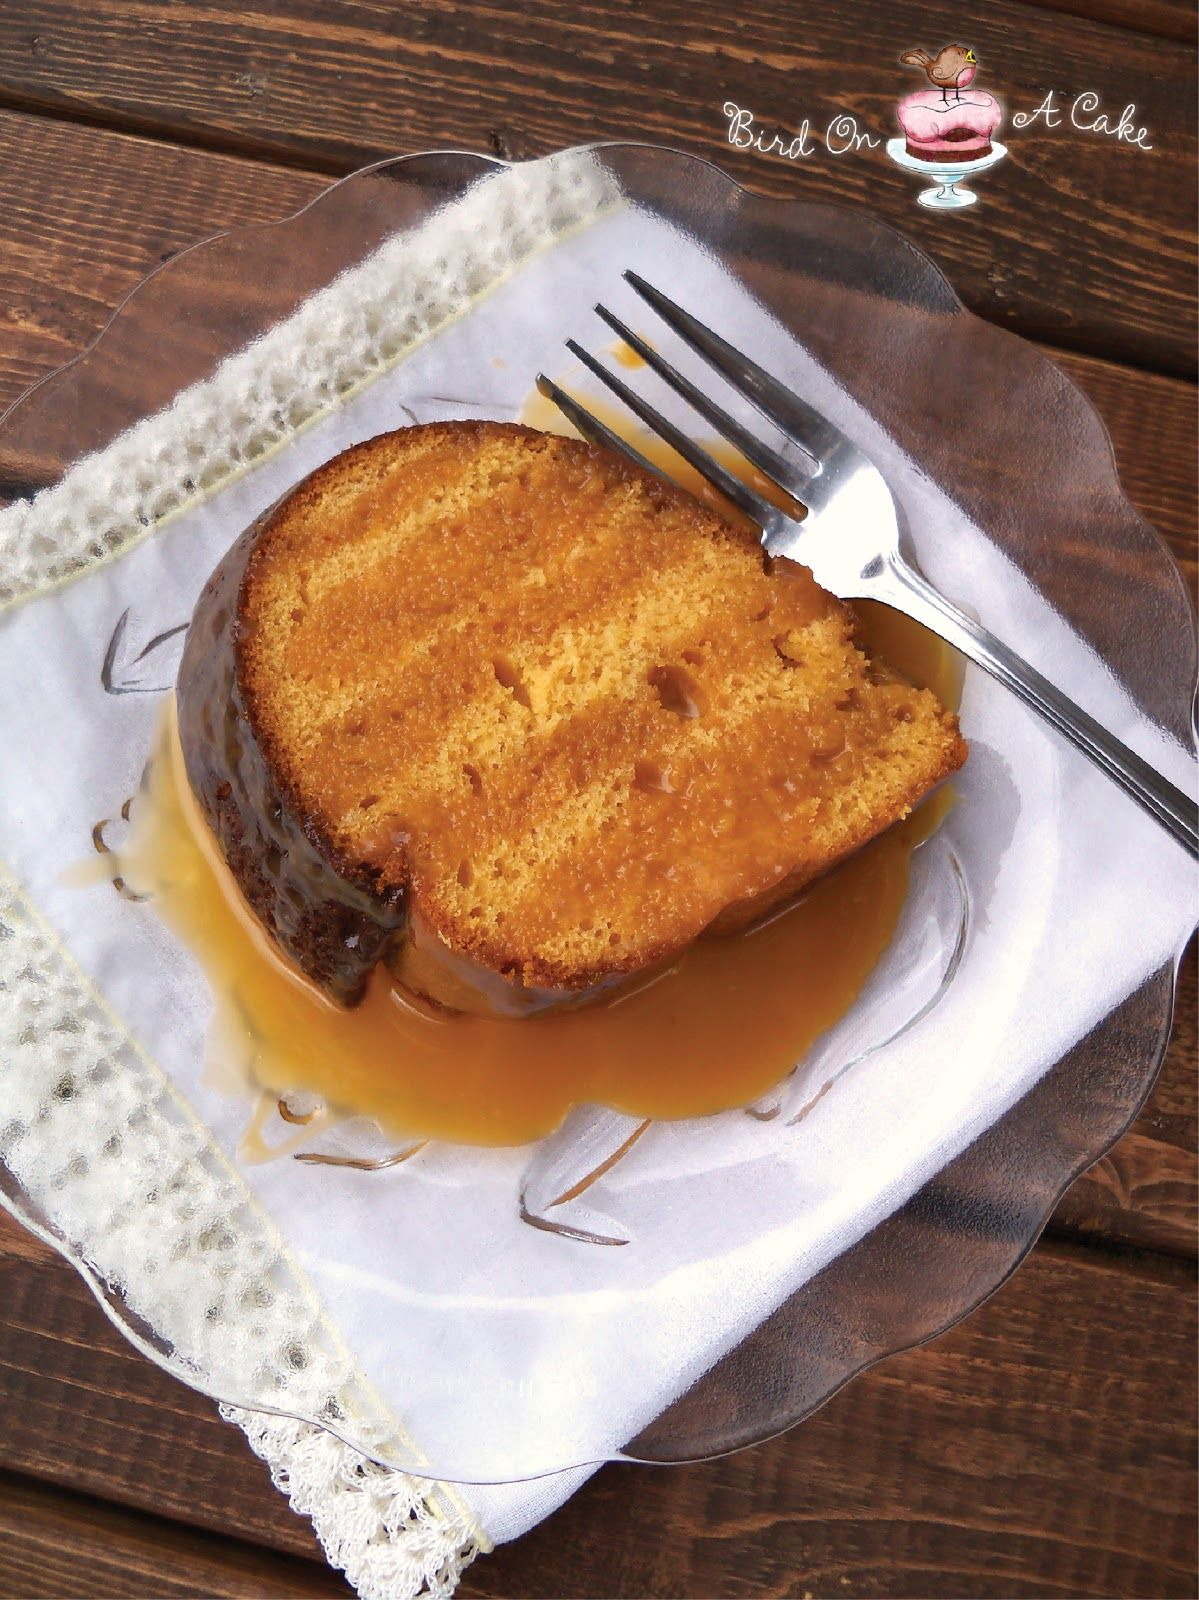 Bird On A Cake: Butterscotch Bundt Cake